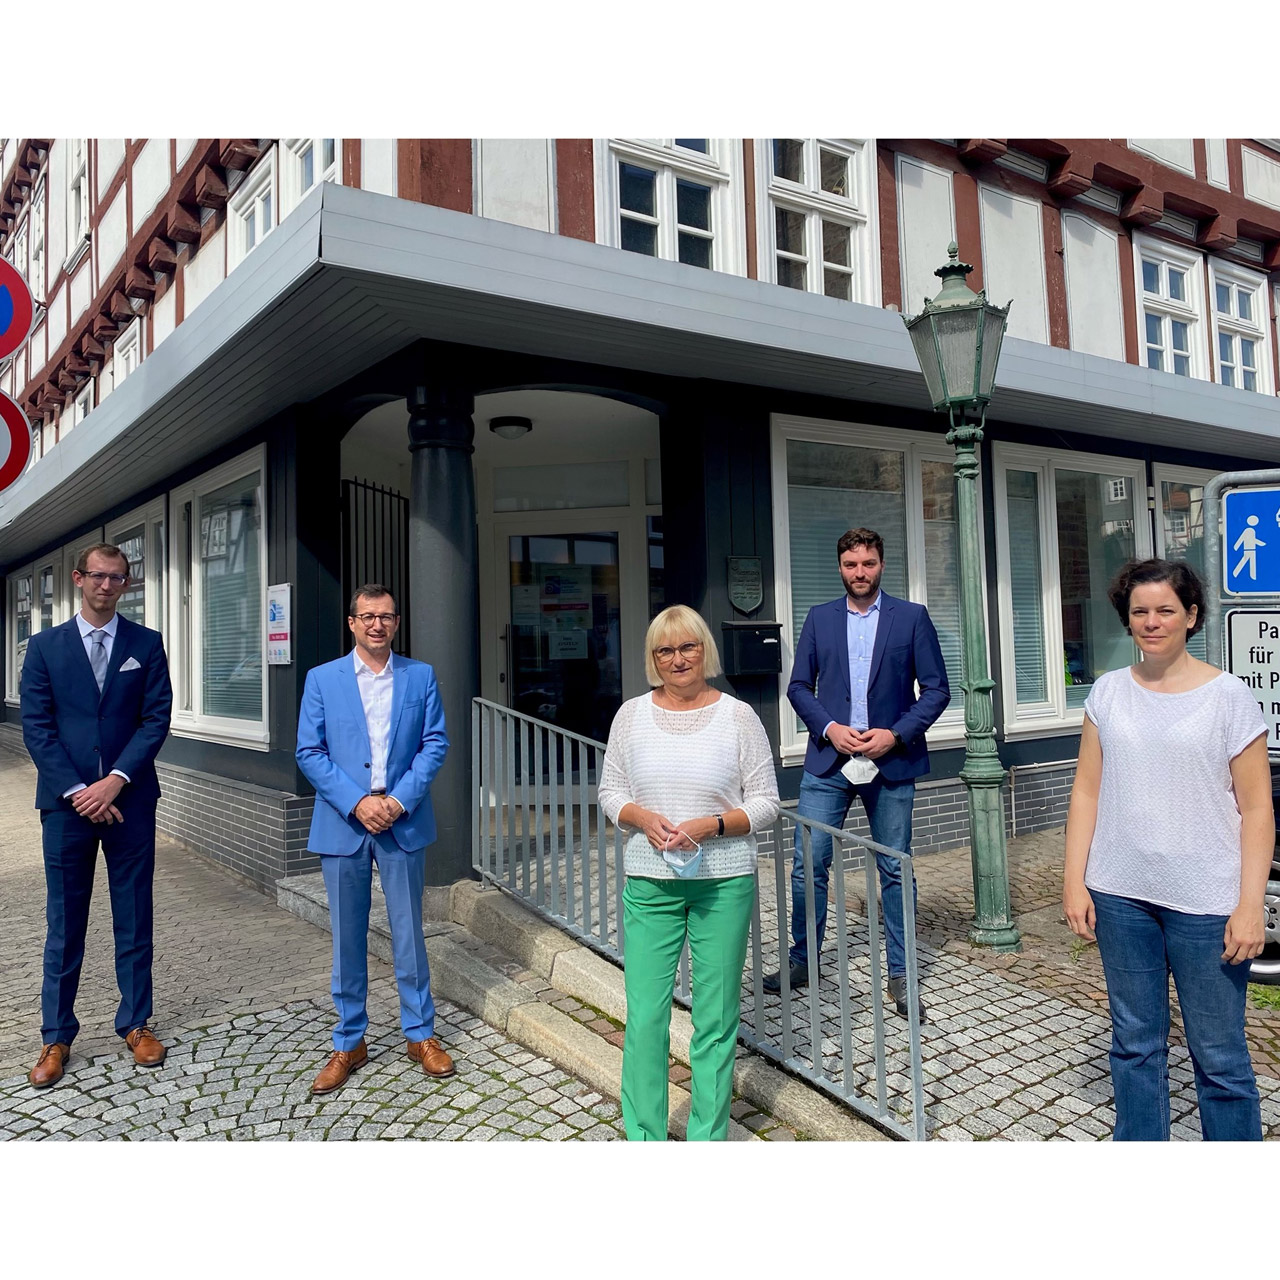 https://www.lichtblick-nordhessen.de/images/news/besuch_hofmann.jpg